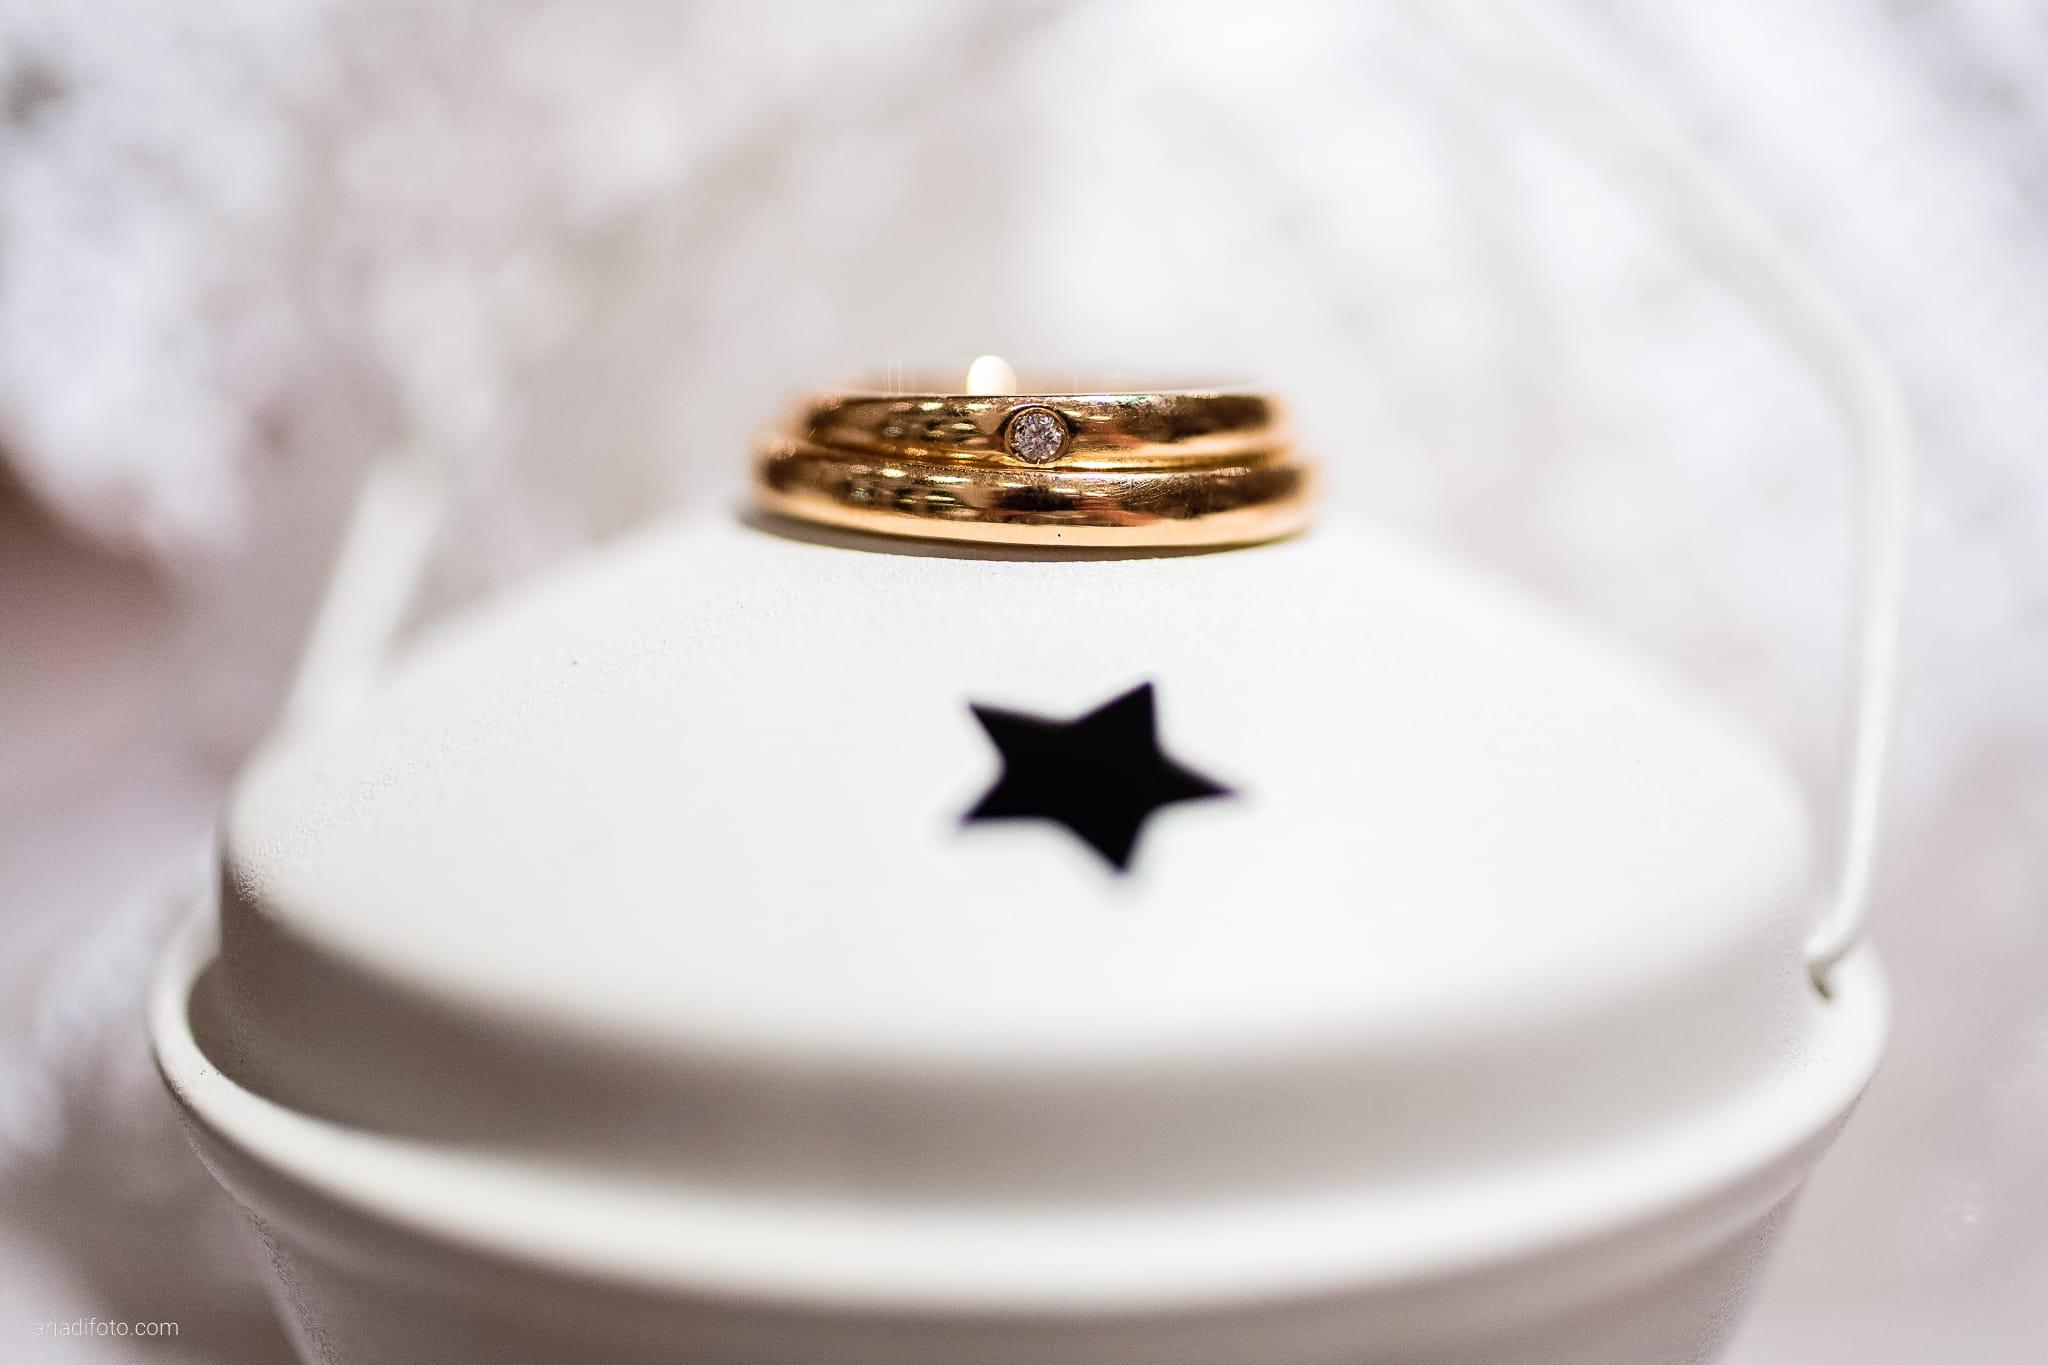 Giorgia Davide Matrimonio Villa Revoltella Salvia Rosmarino Trieste ricevimento dettagli anelli